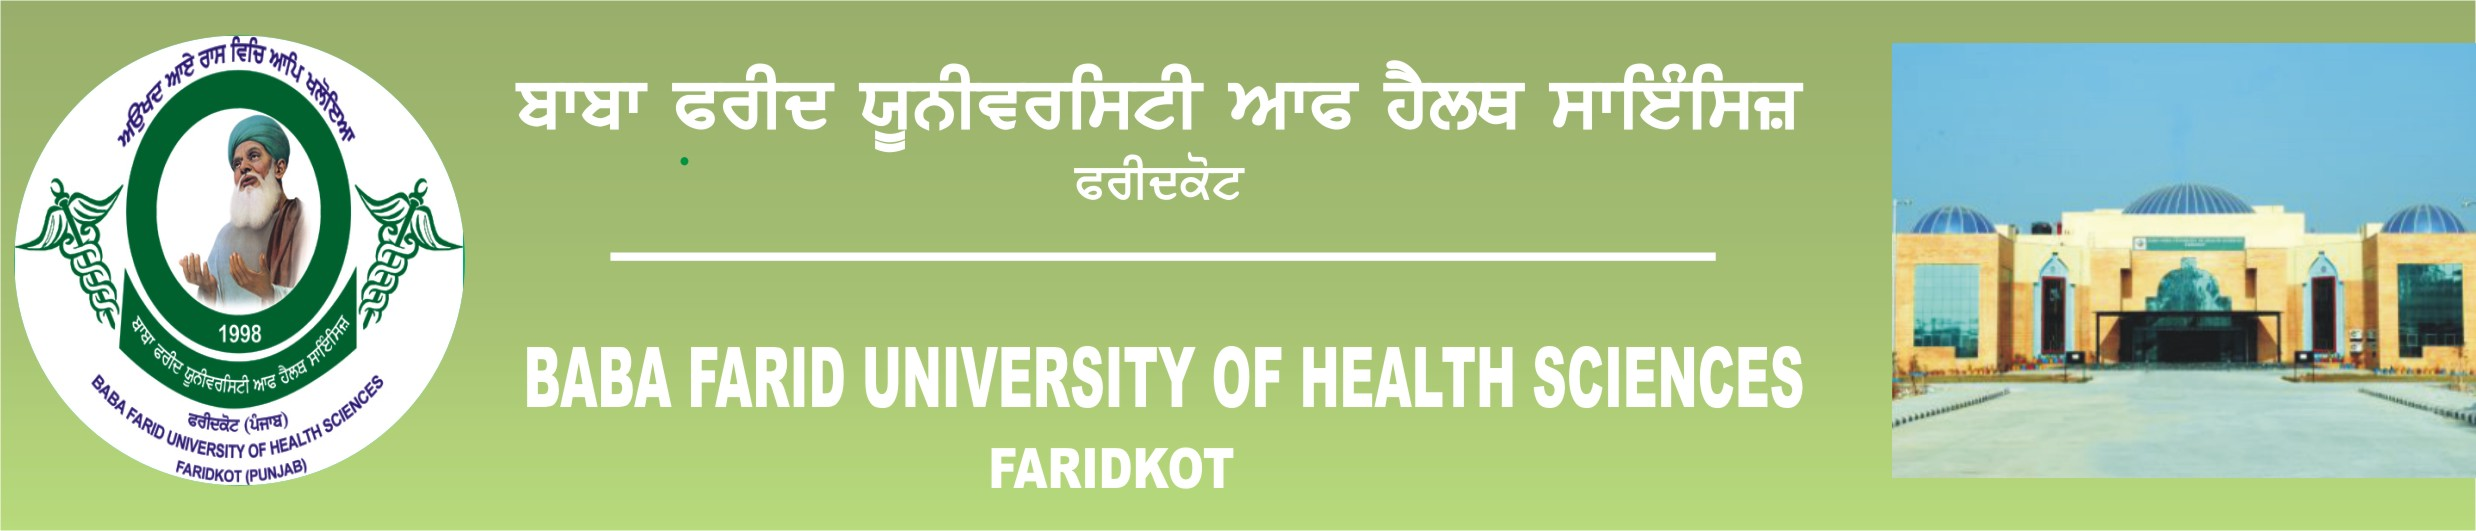 Baba Farid University of Health Sciendes,Faridkot